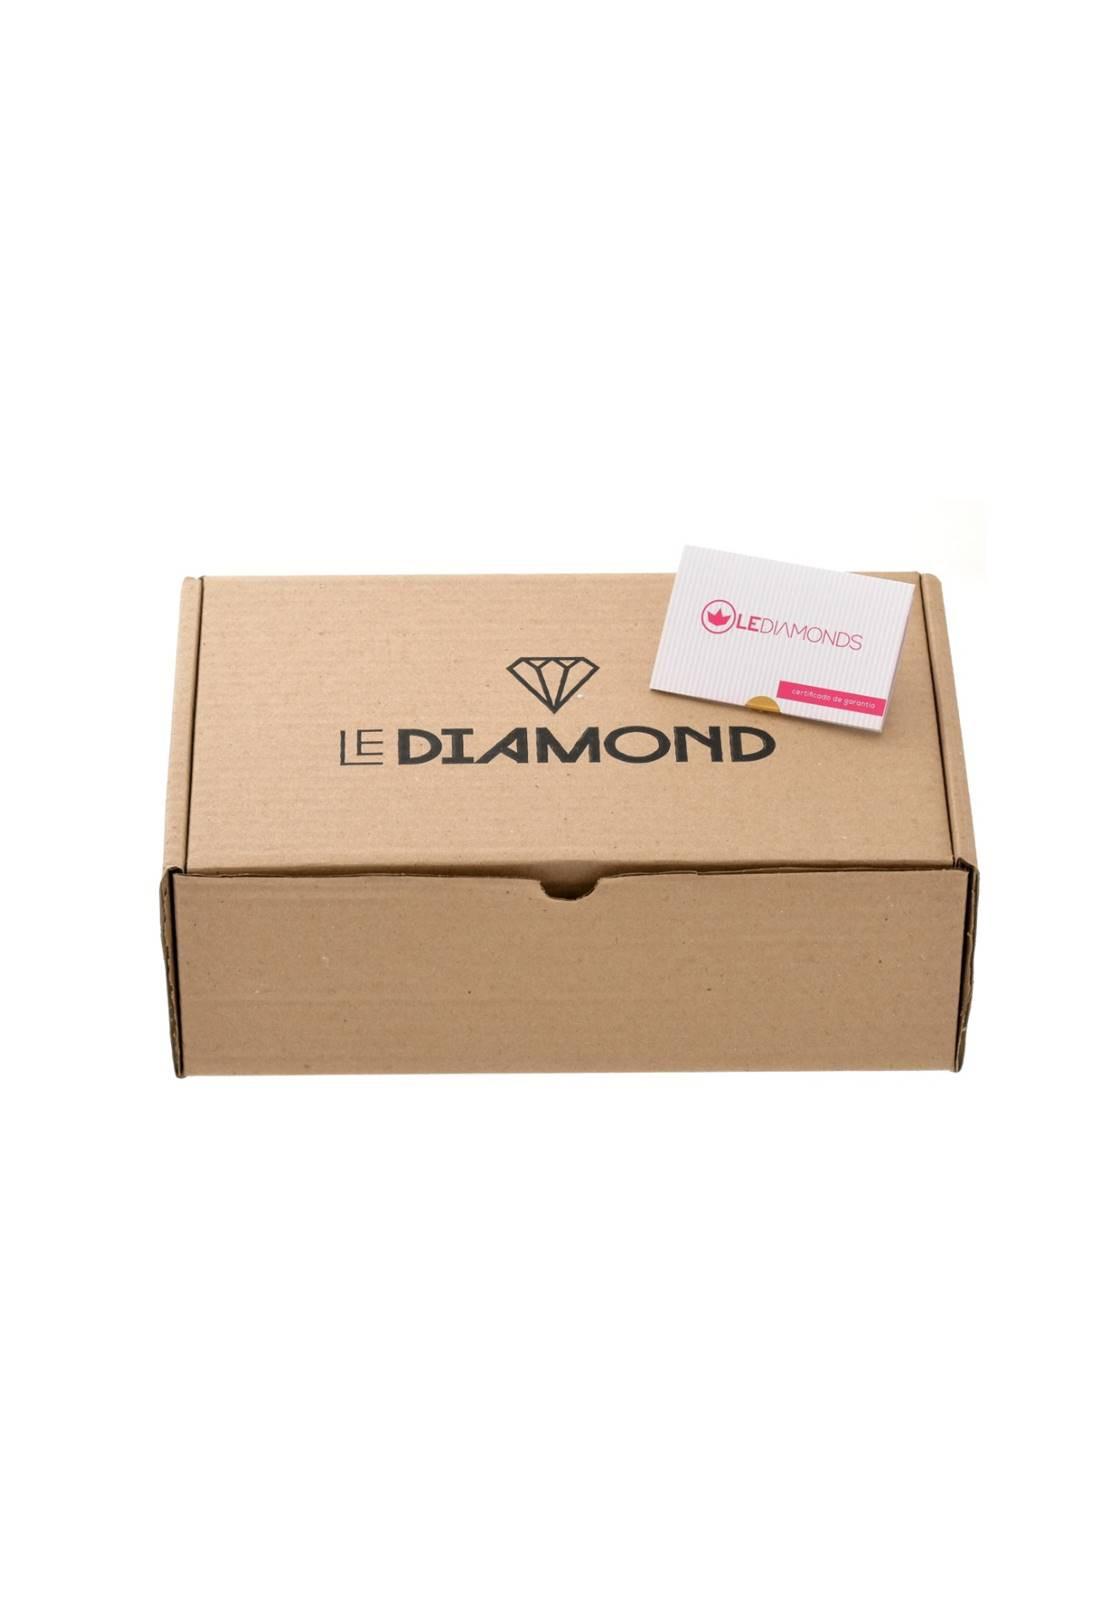 Brinco Le Diamond Brinco Brecheret Brinco Cascata Bolinha Metal Dourado